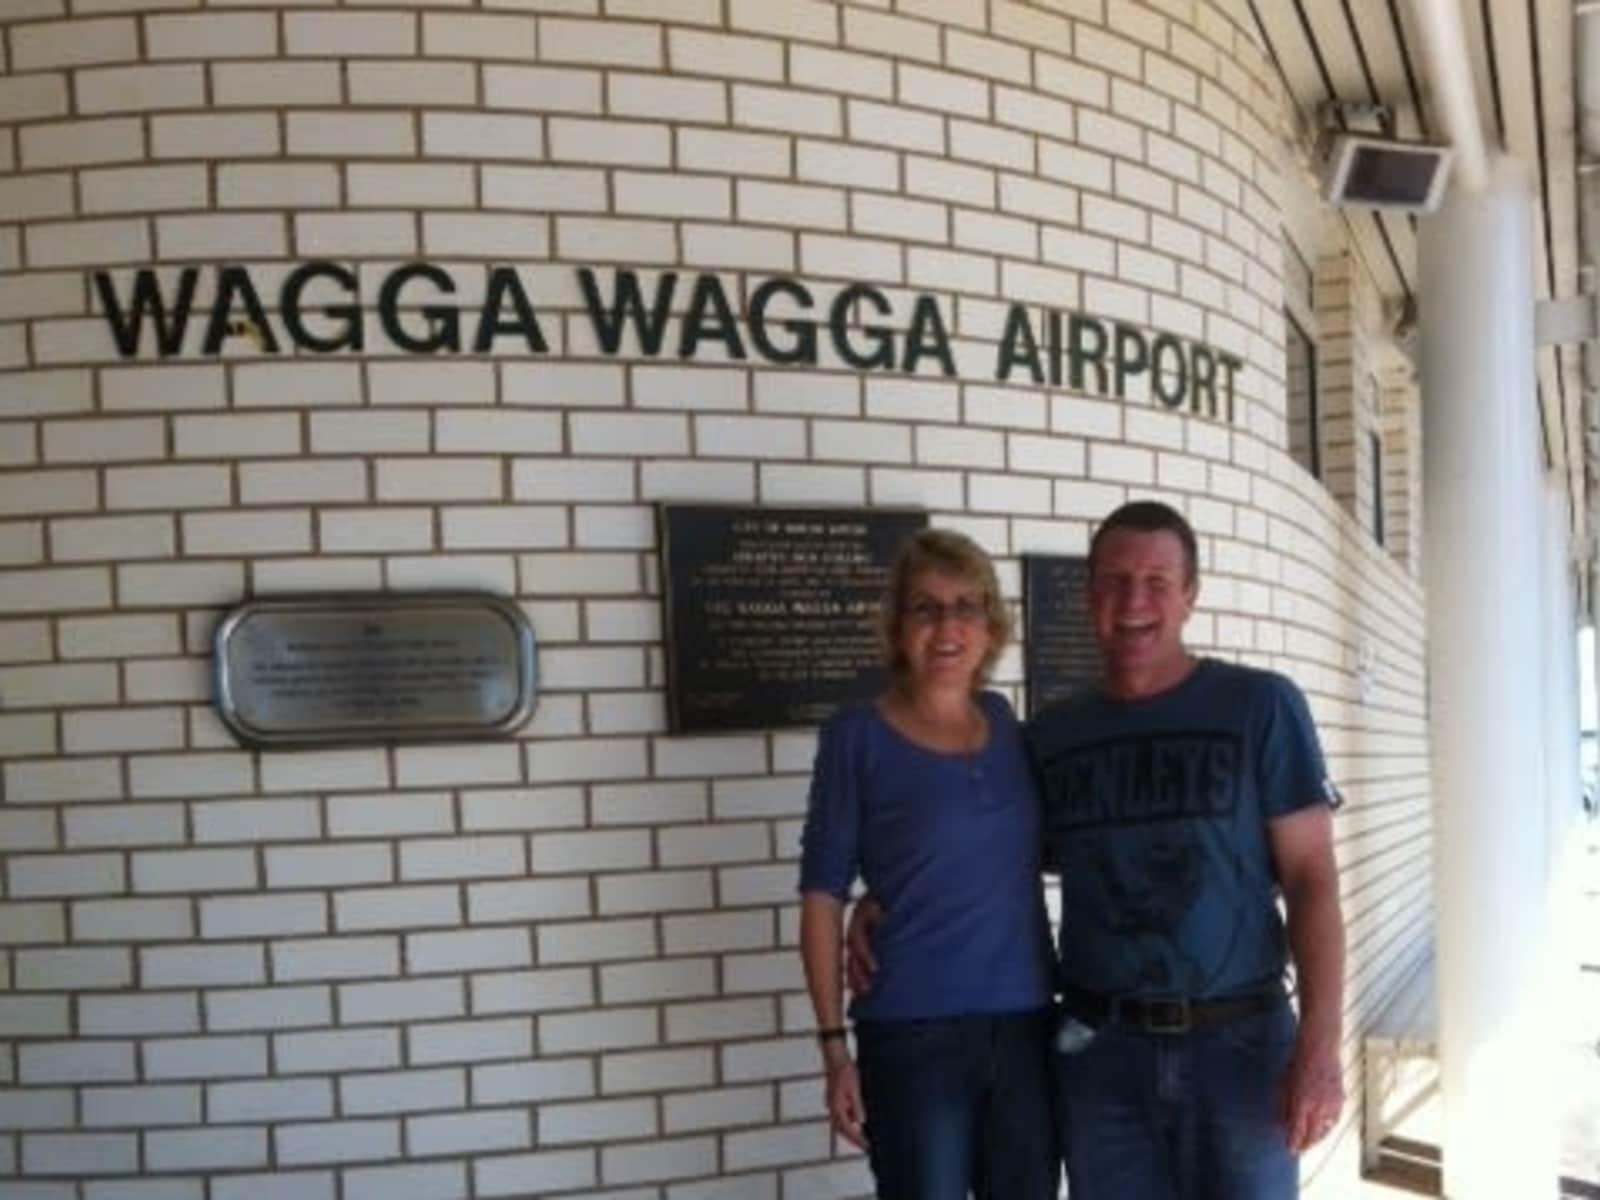 Wayne & Jacqui from Wagga Wagga, New South Wales, Australia